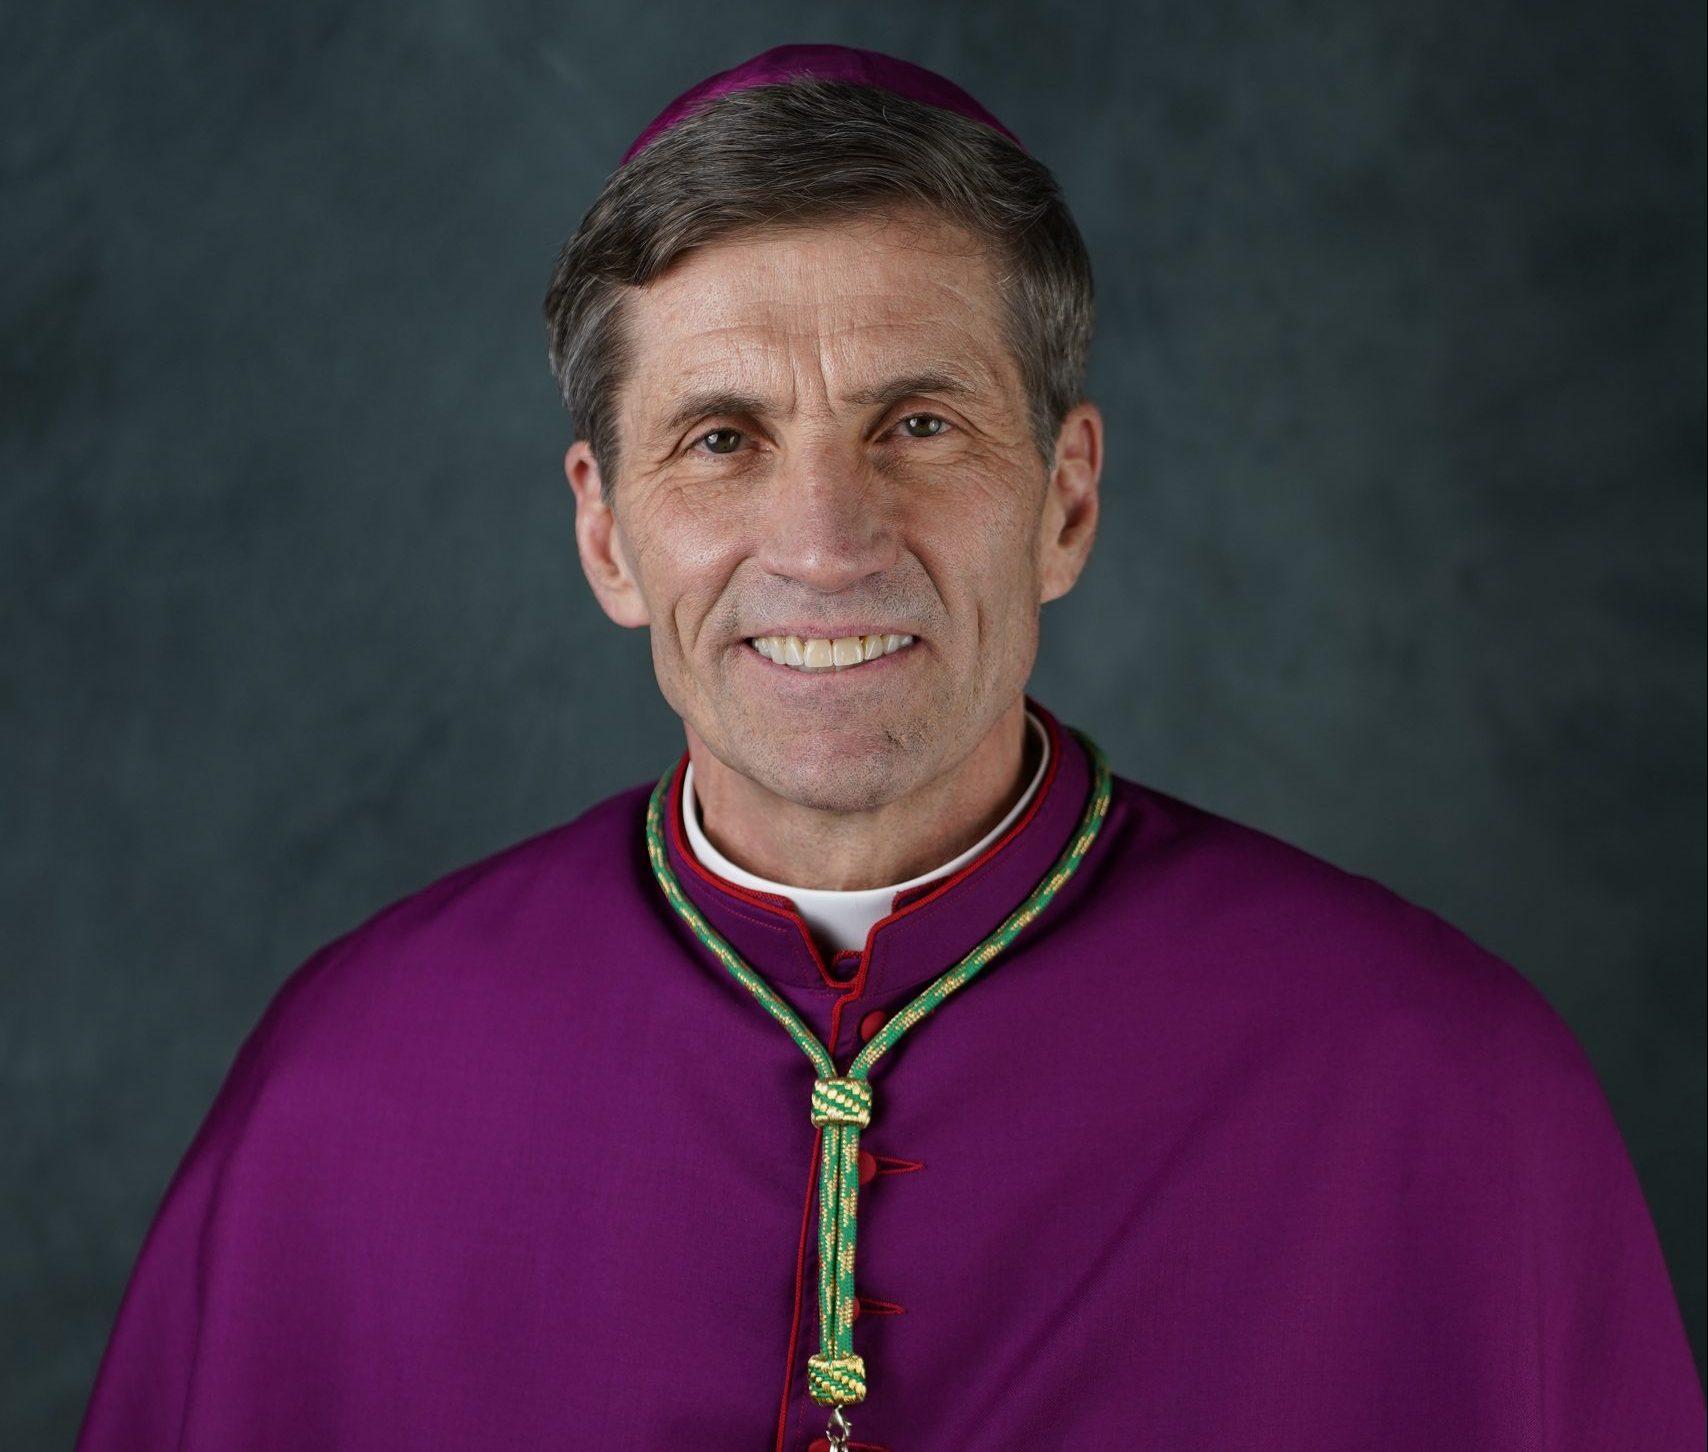 Live stream Mass of Ordination